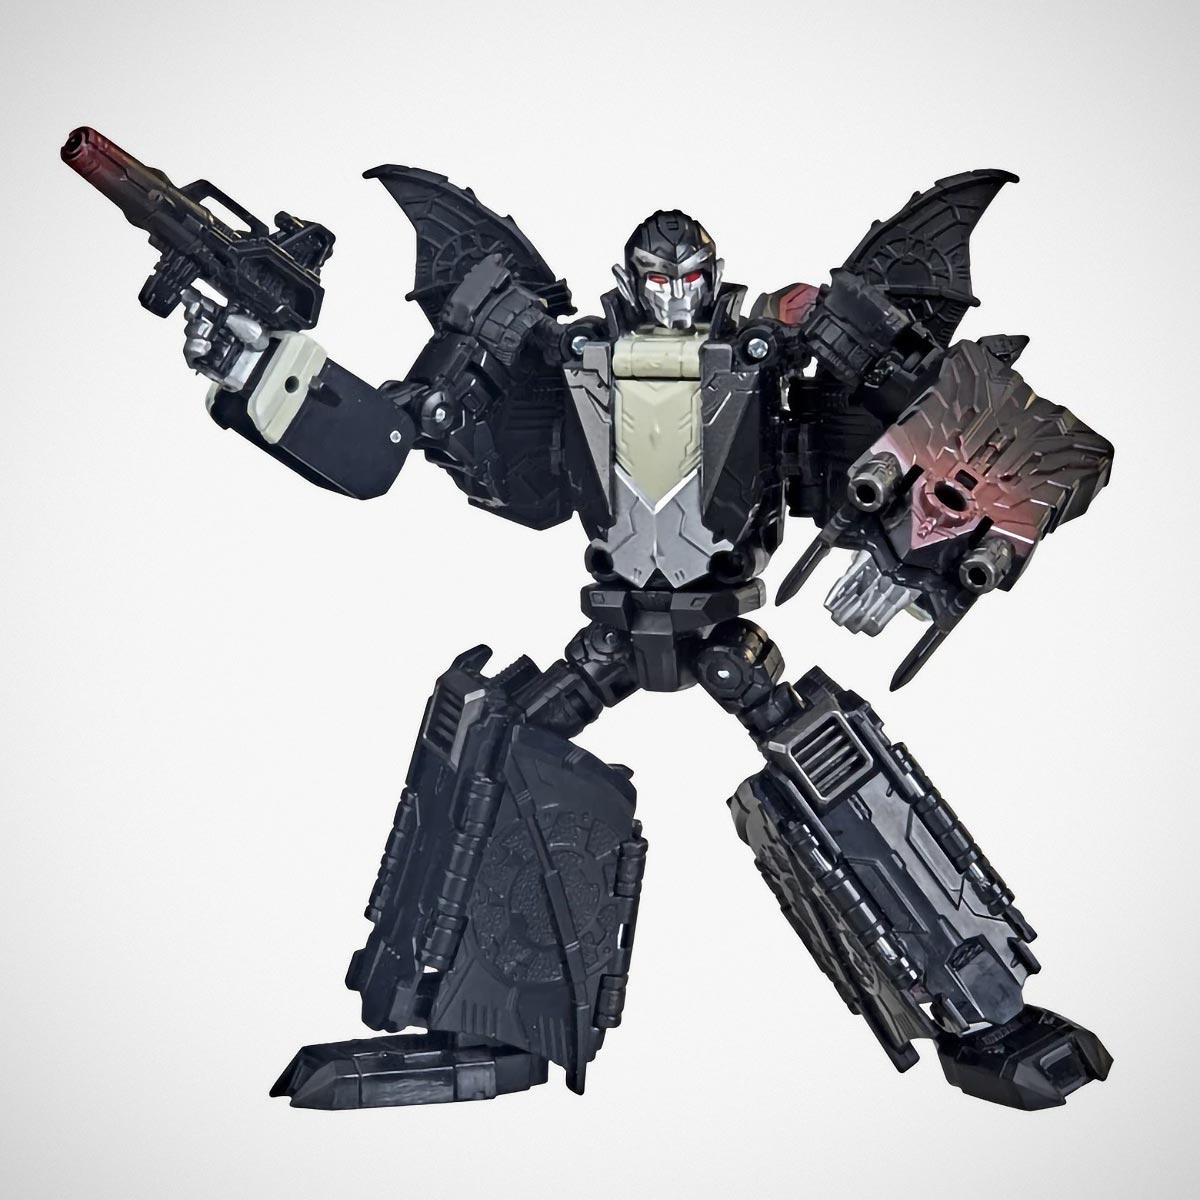 Transformers x Universal Monsters Dracula Figure